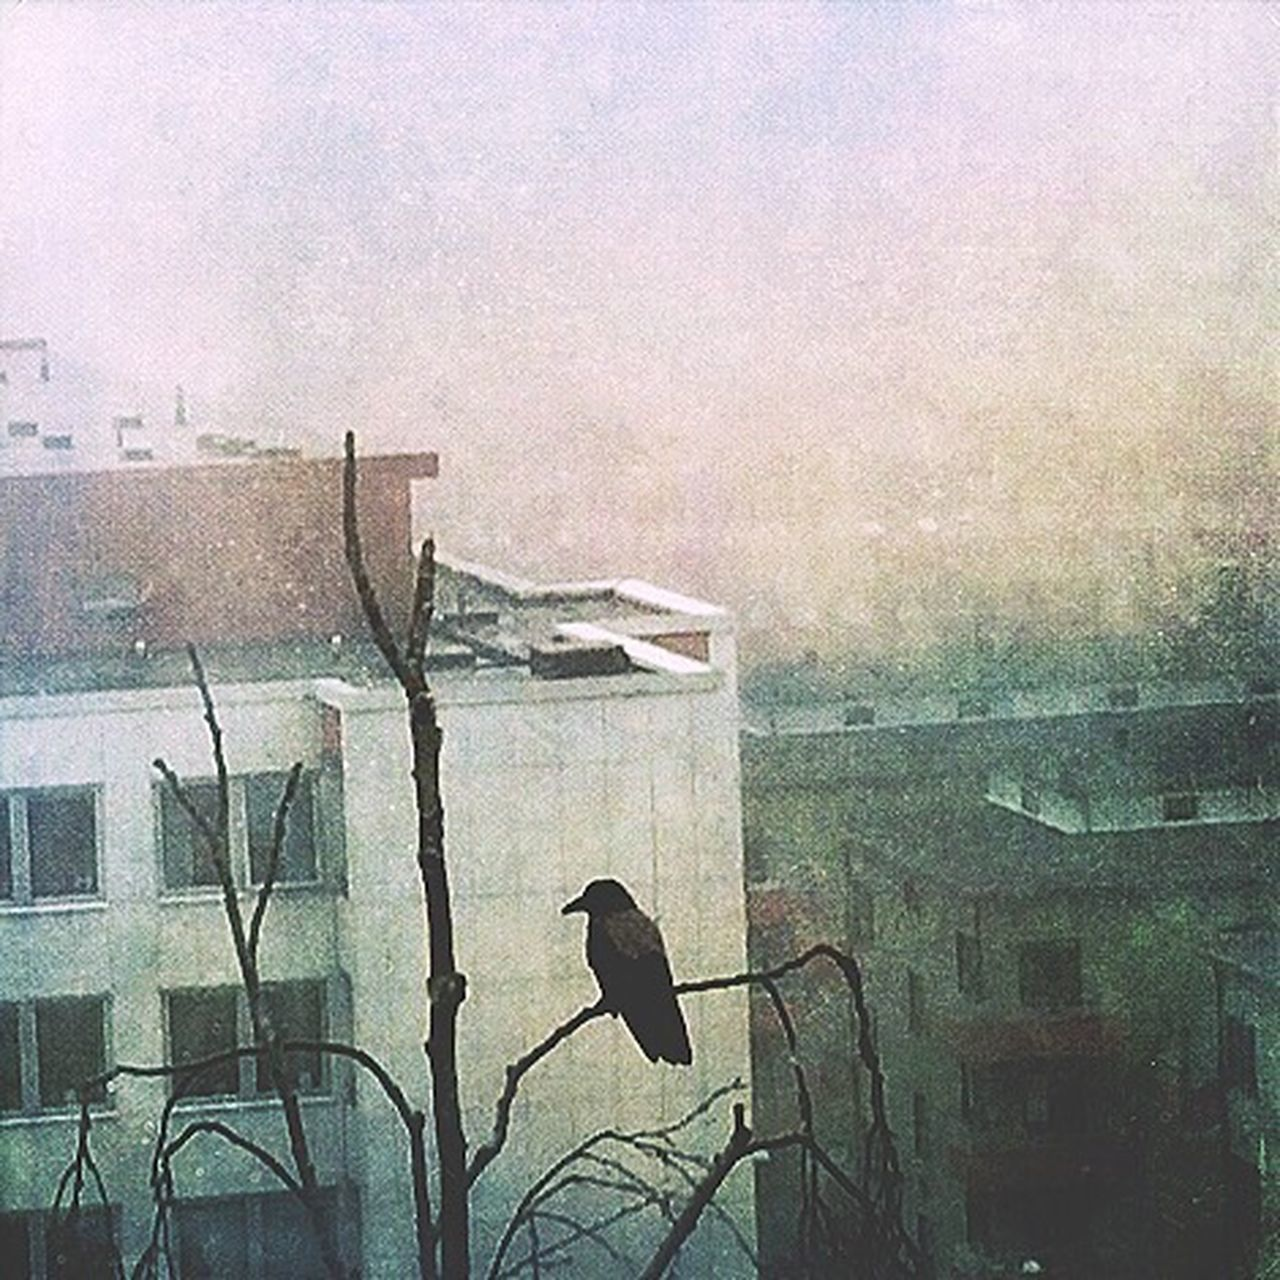 Blackbird Mist From Above  City Bird Foggy Day